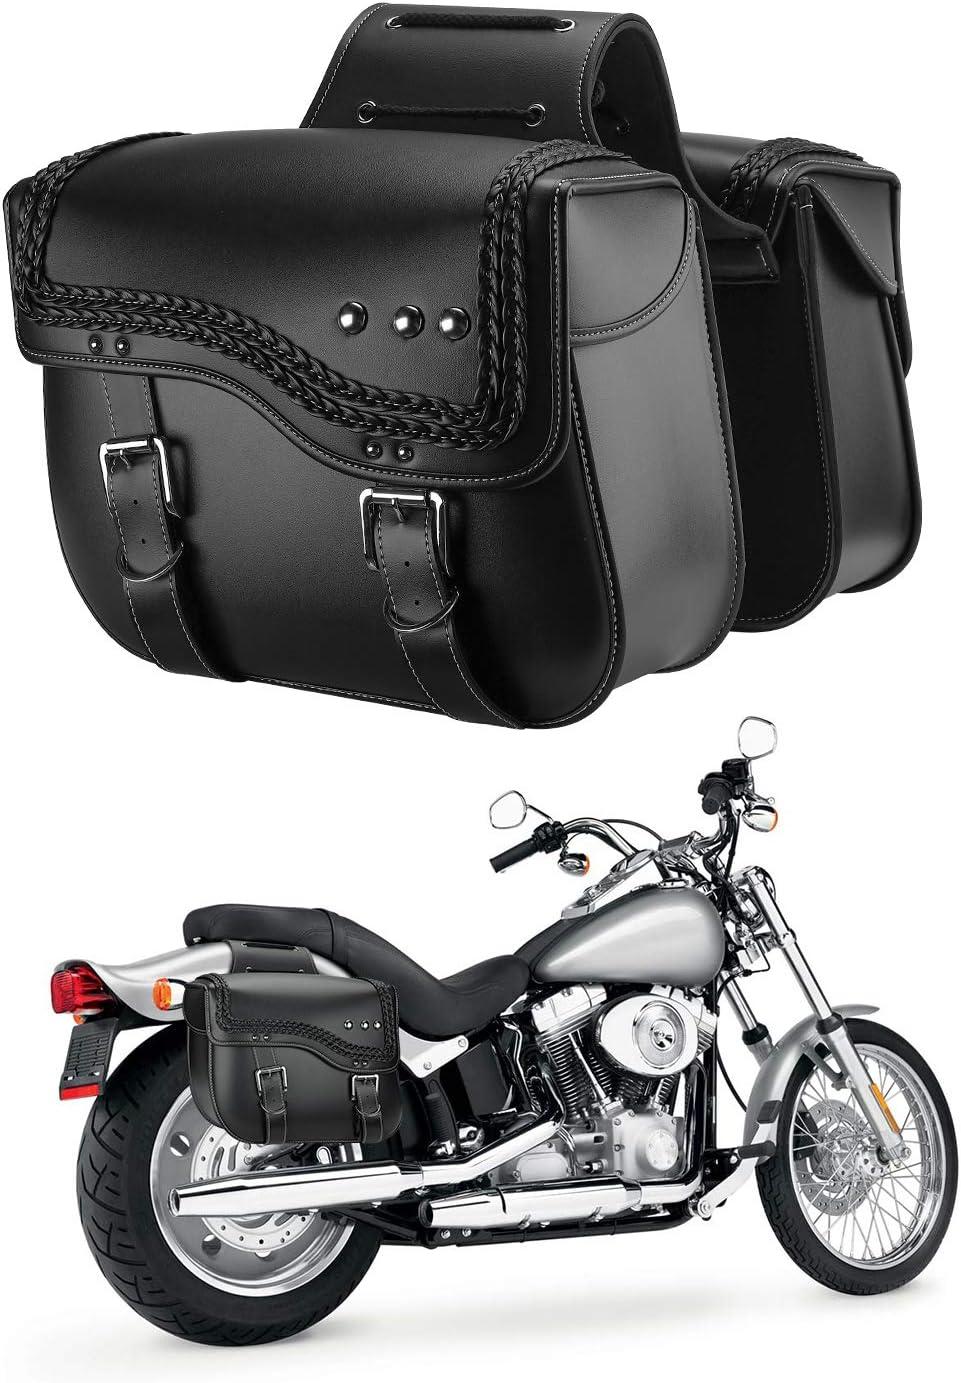 Kemimoto Motorcycle Saddlebags